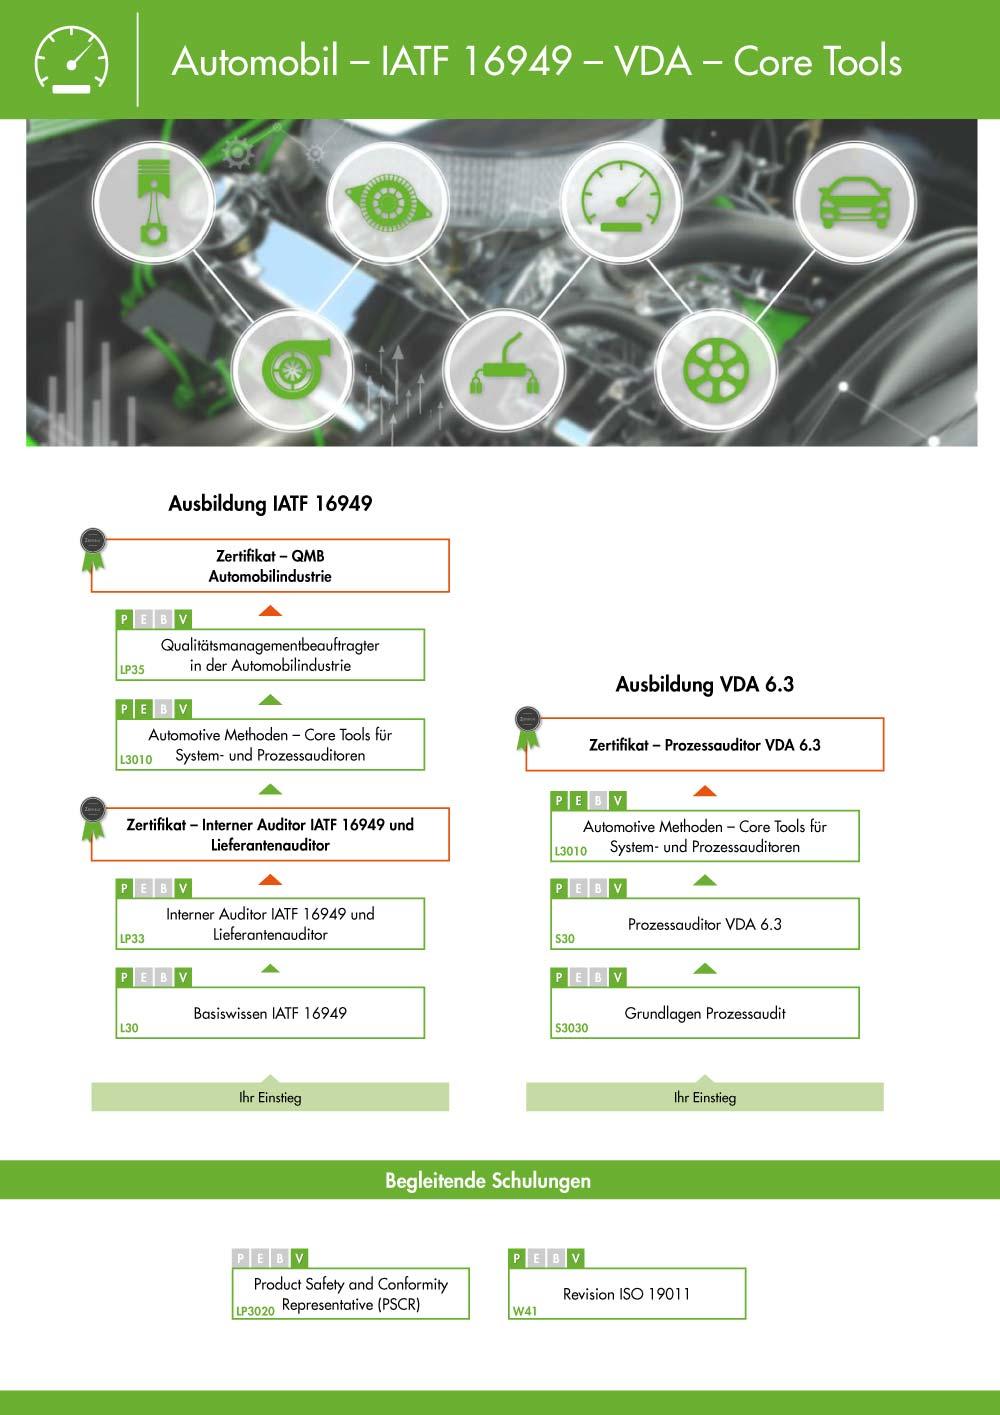 Ausbildungsübersicht - Qualitätsmanagement Automobil